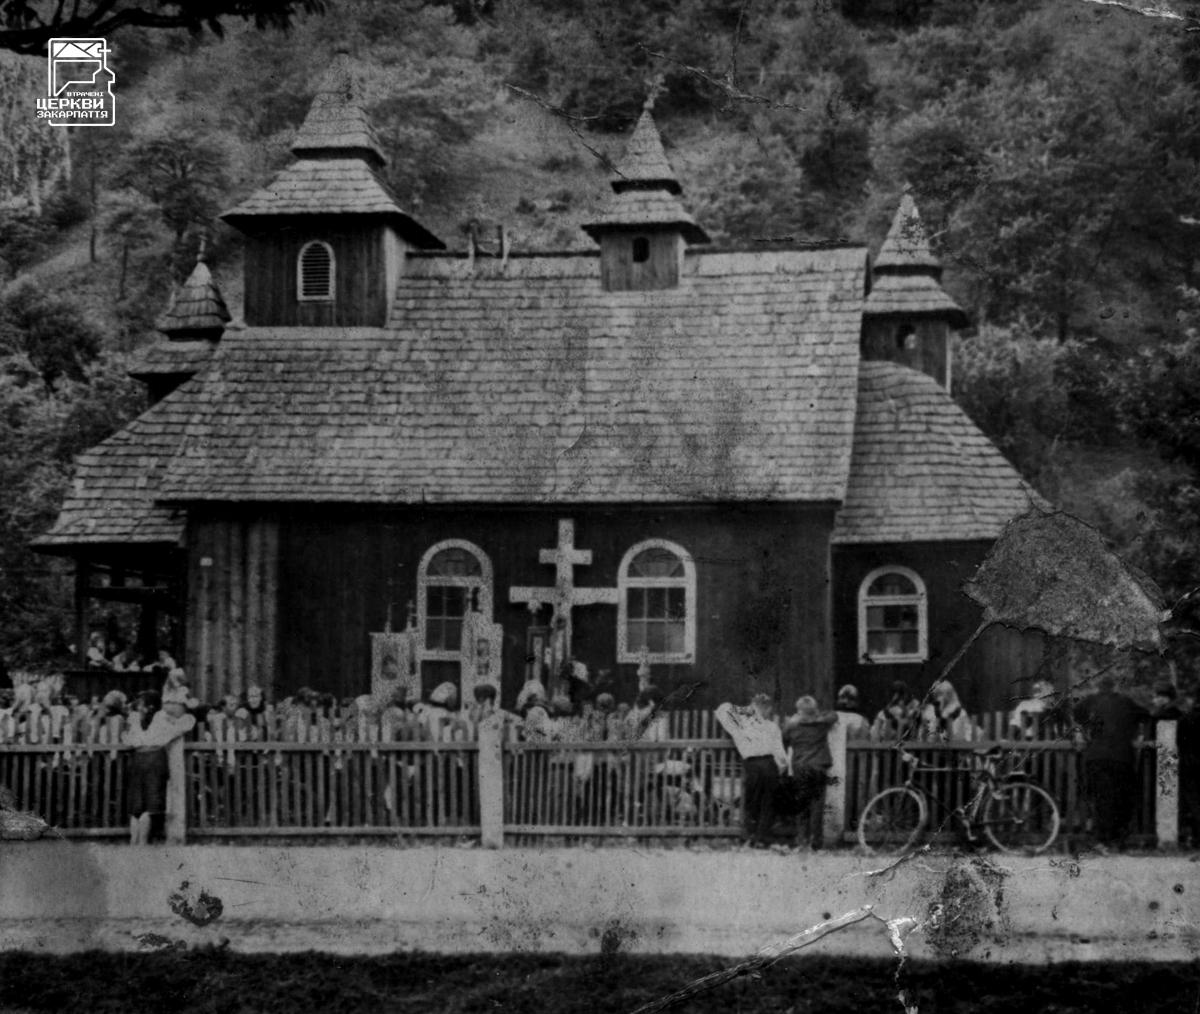 Православна церква свв. ап. Петра і Павла, РАХІВ (НОВОСЕЛИЦЯ), село